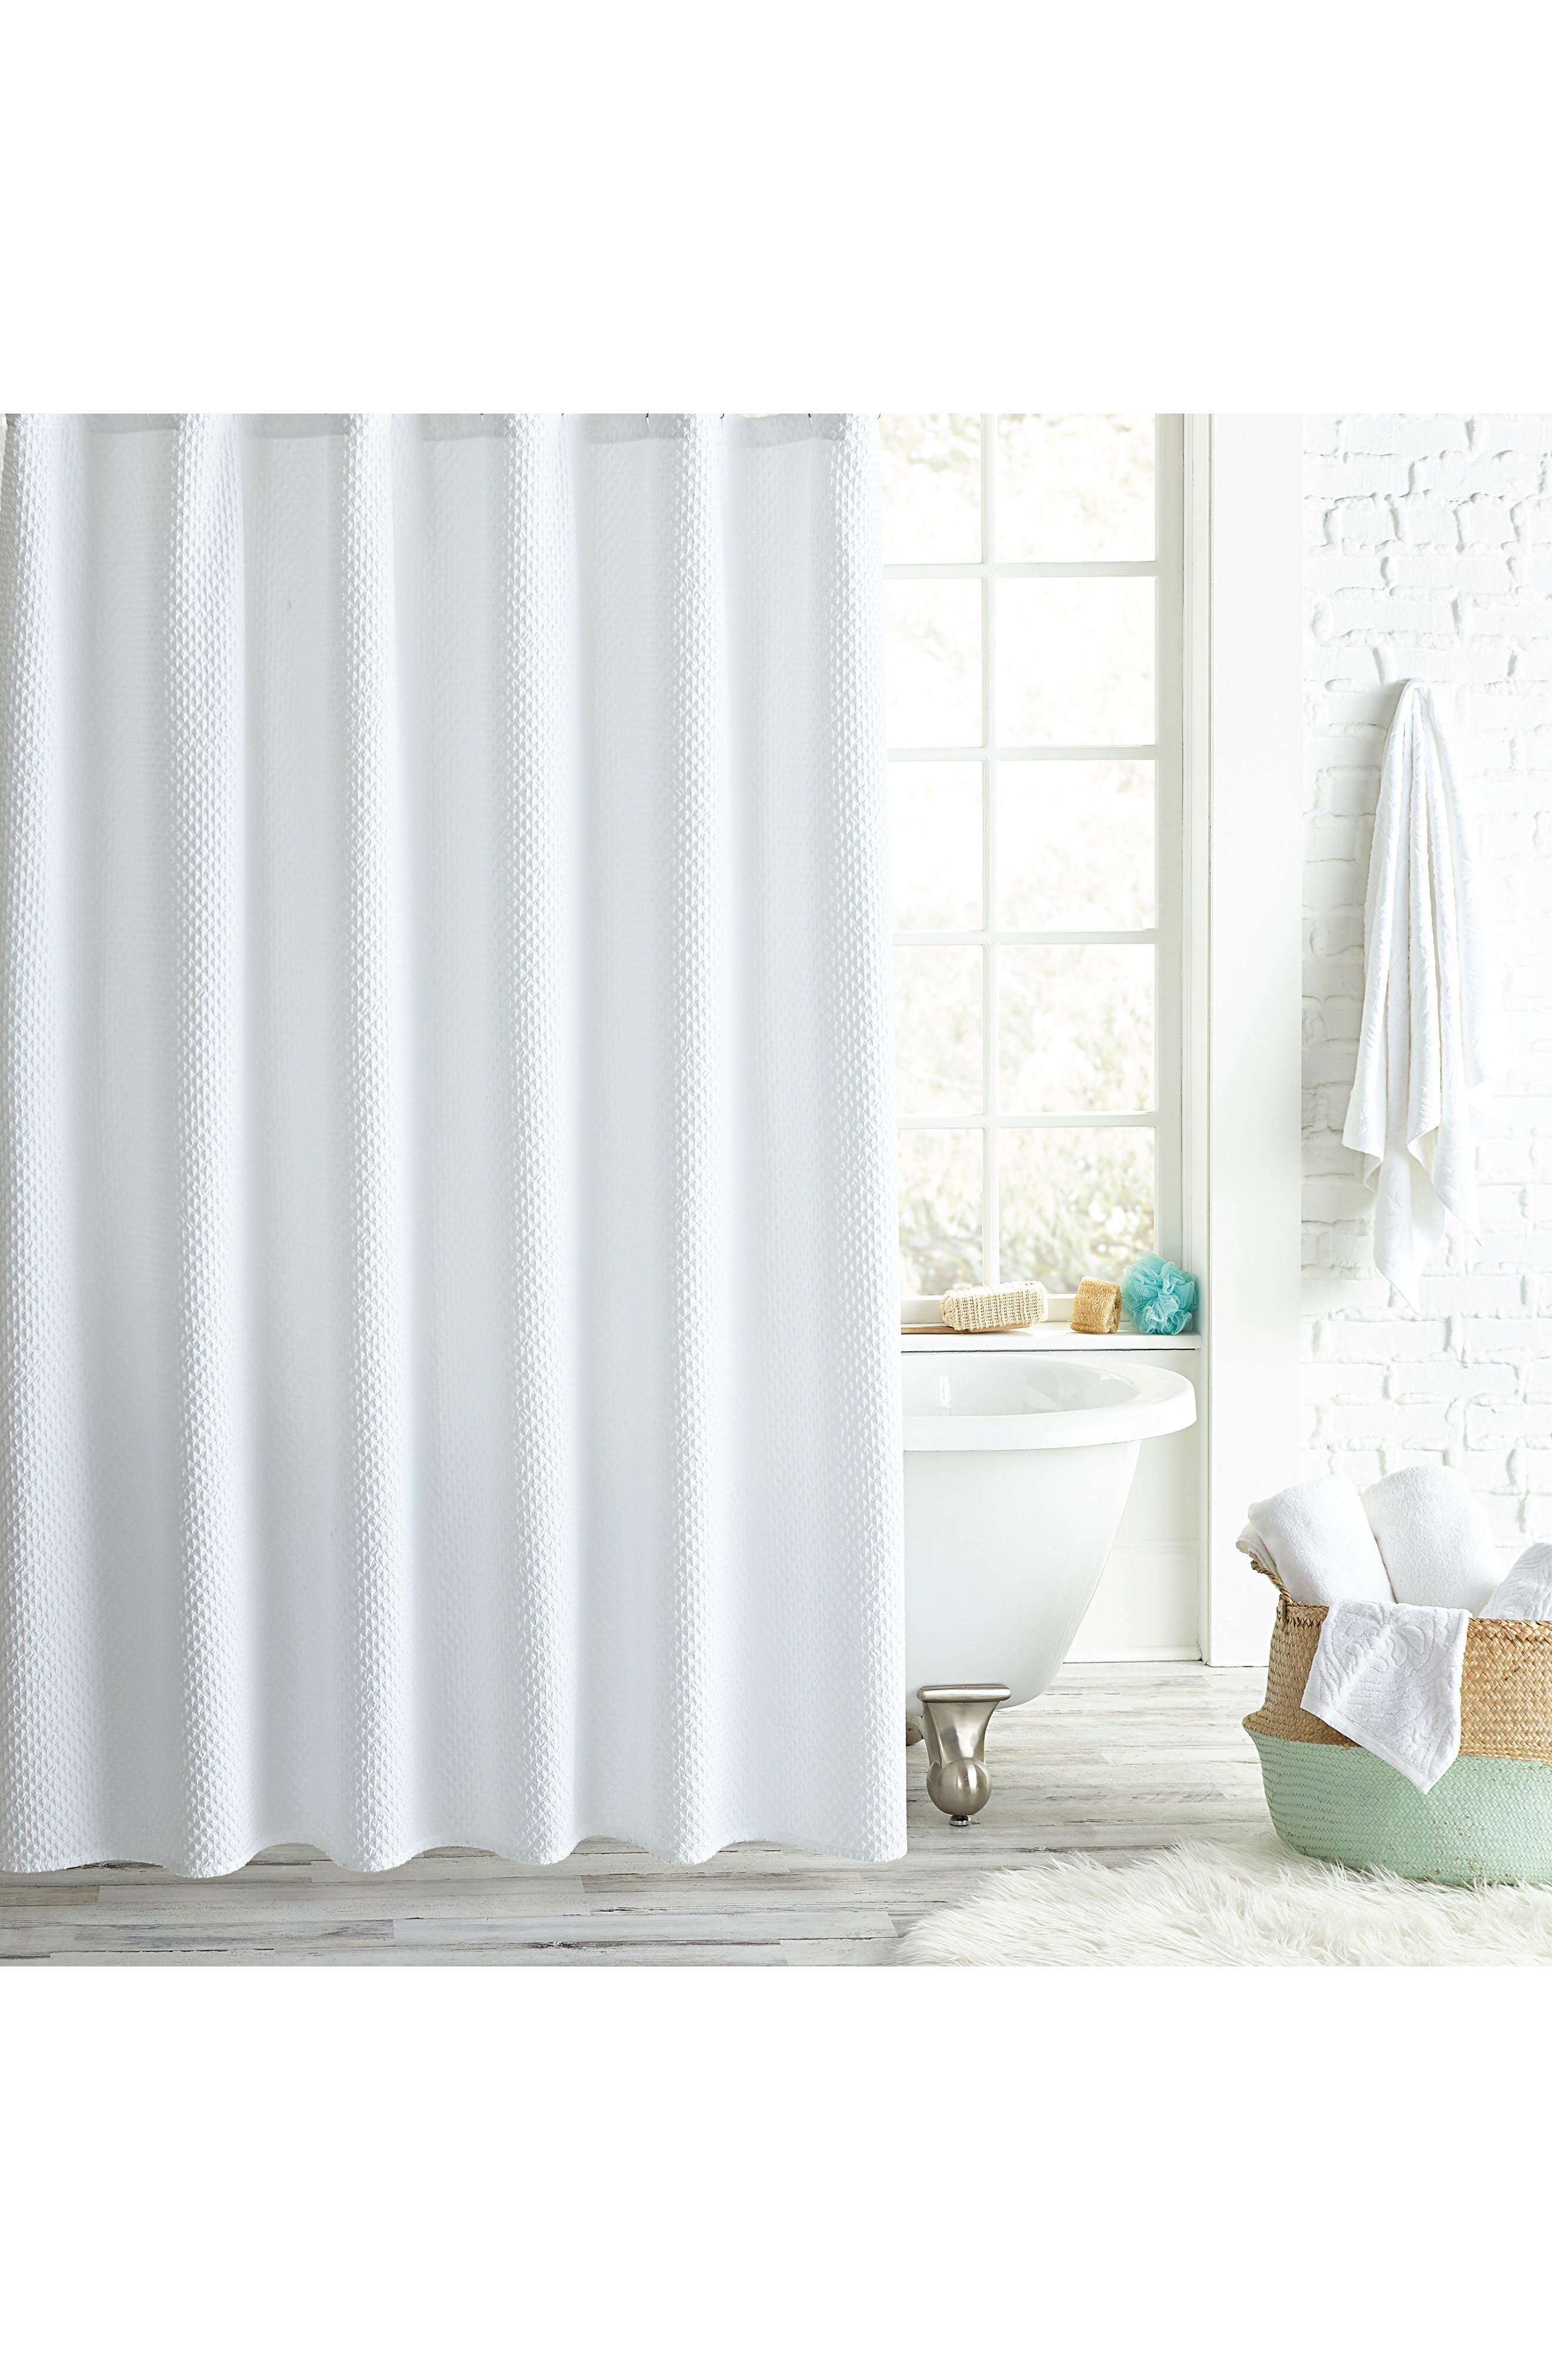 Peri Home Bath & Shower Accessories | Nordstrom